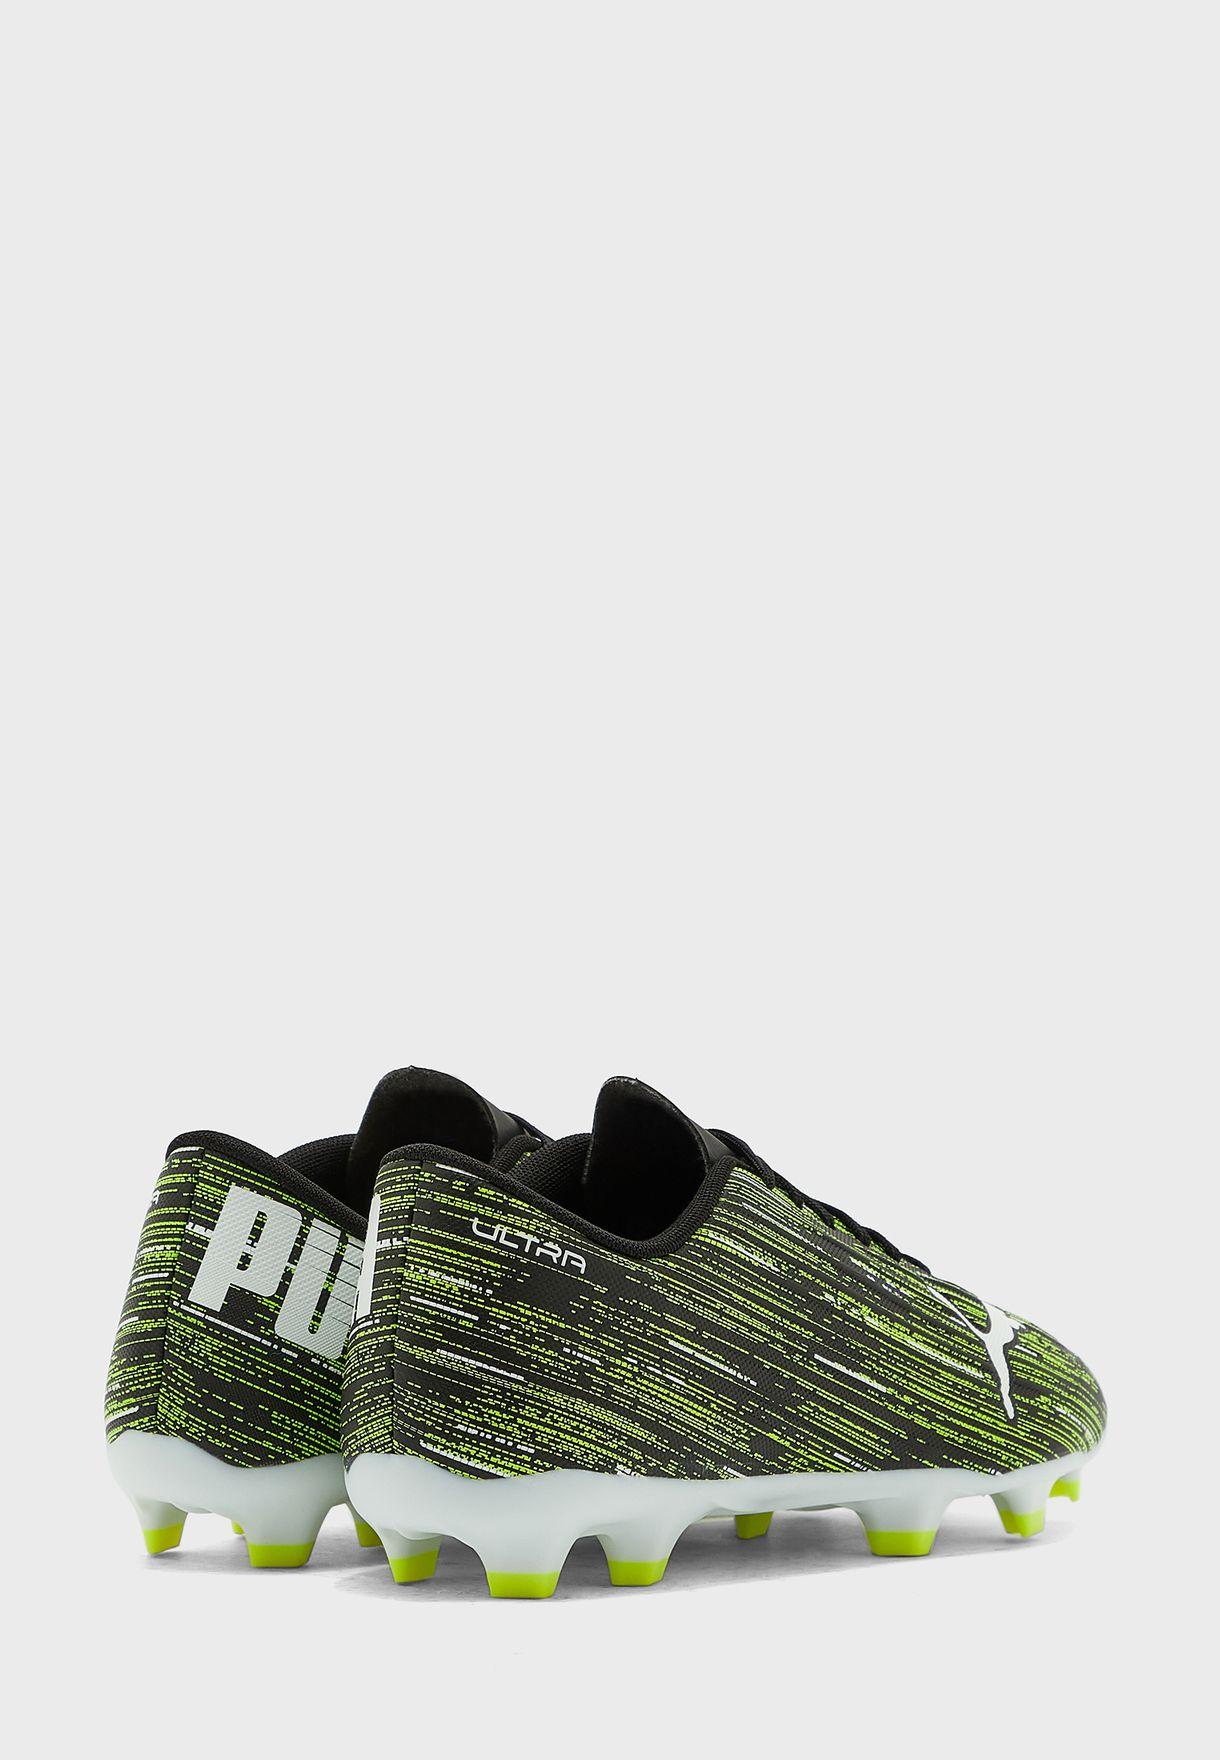 حذاء الترا 4.2 اف جي/ ايه جي